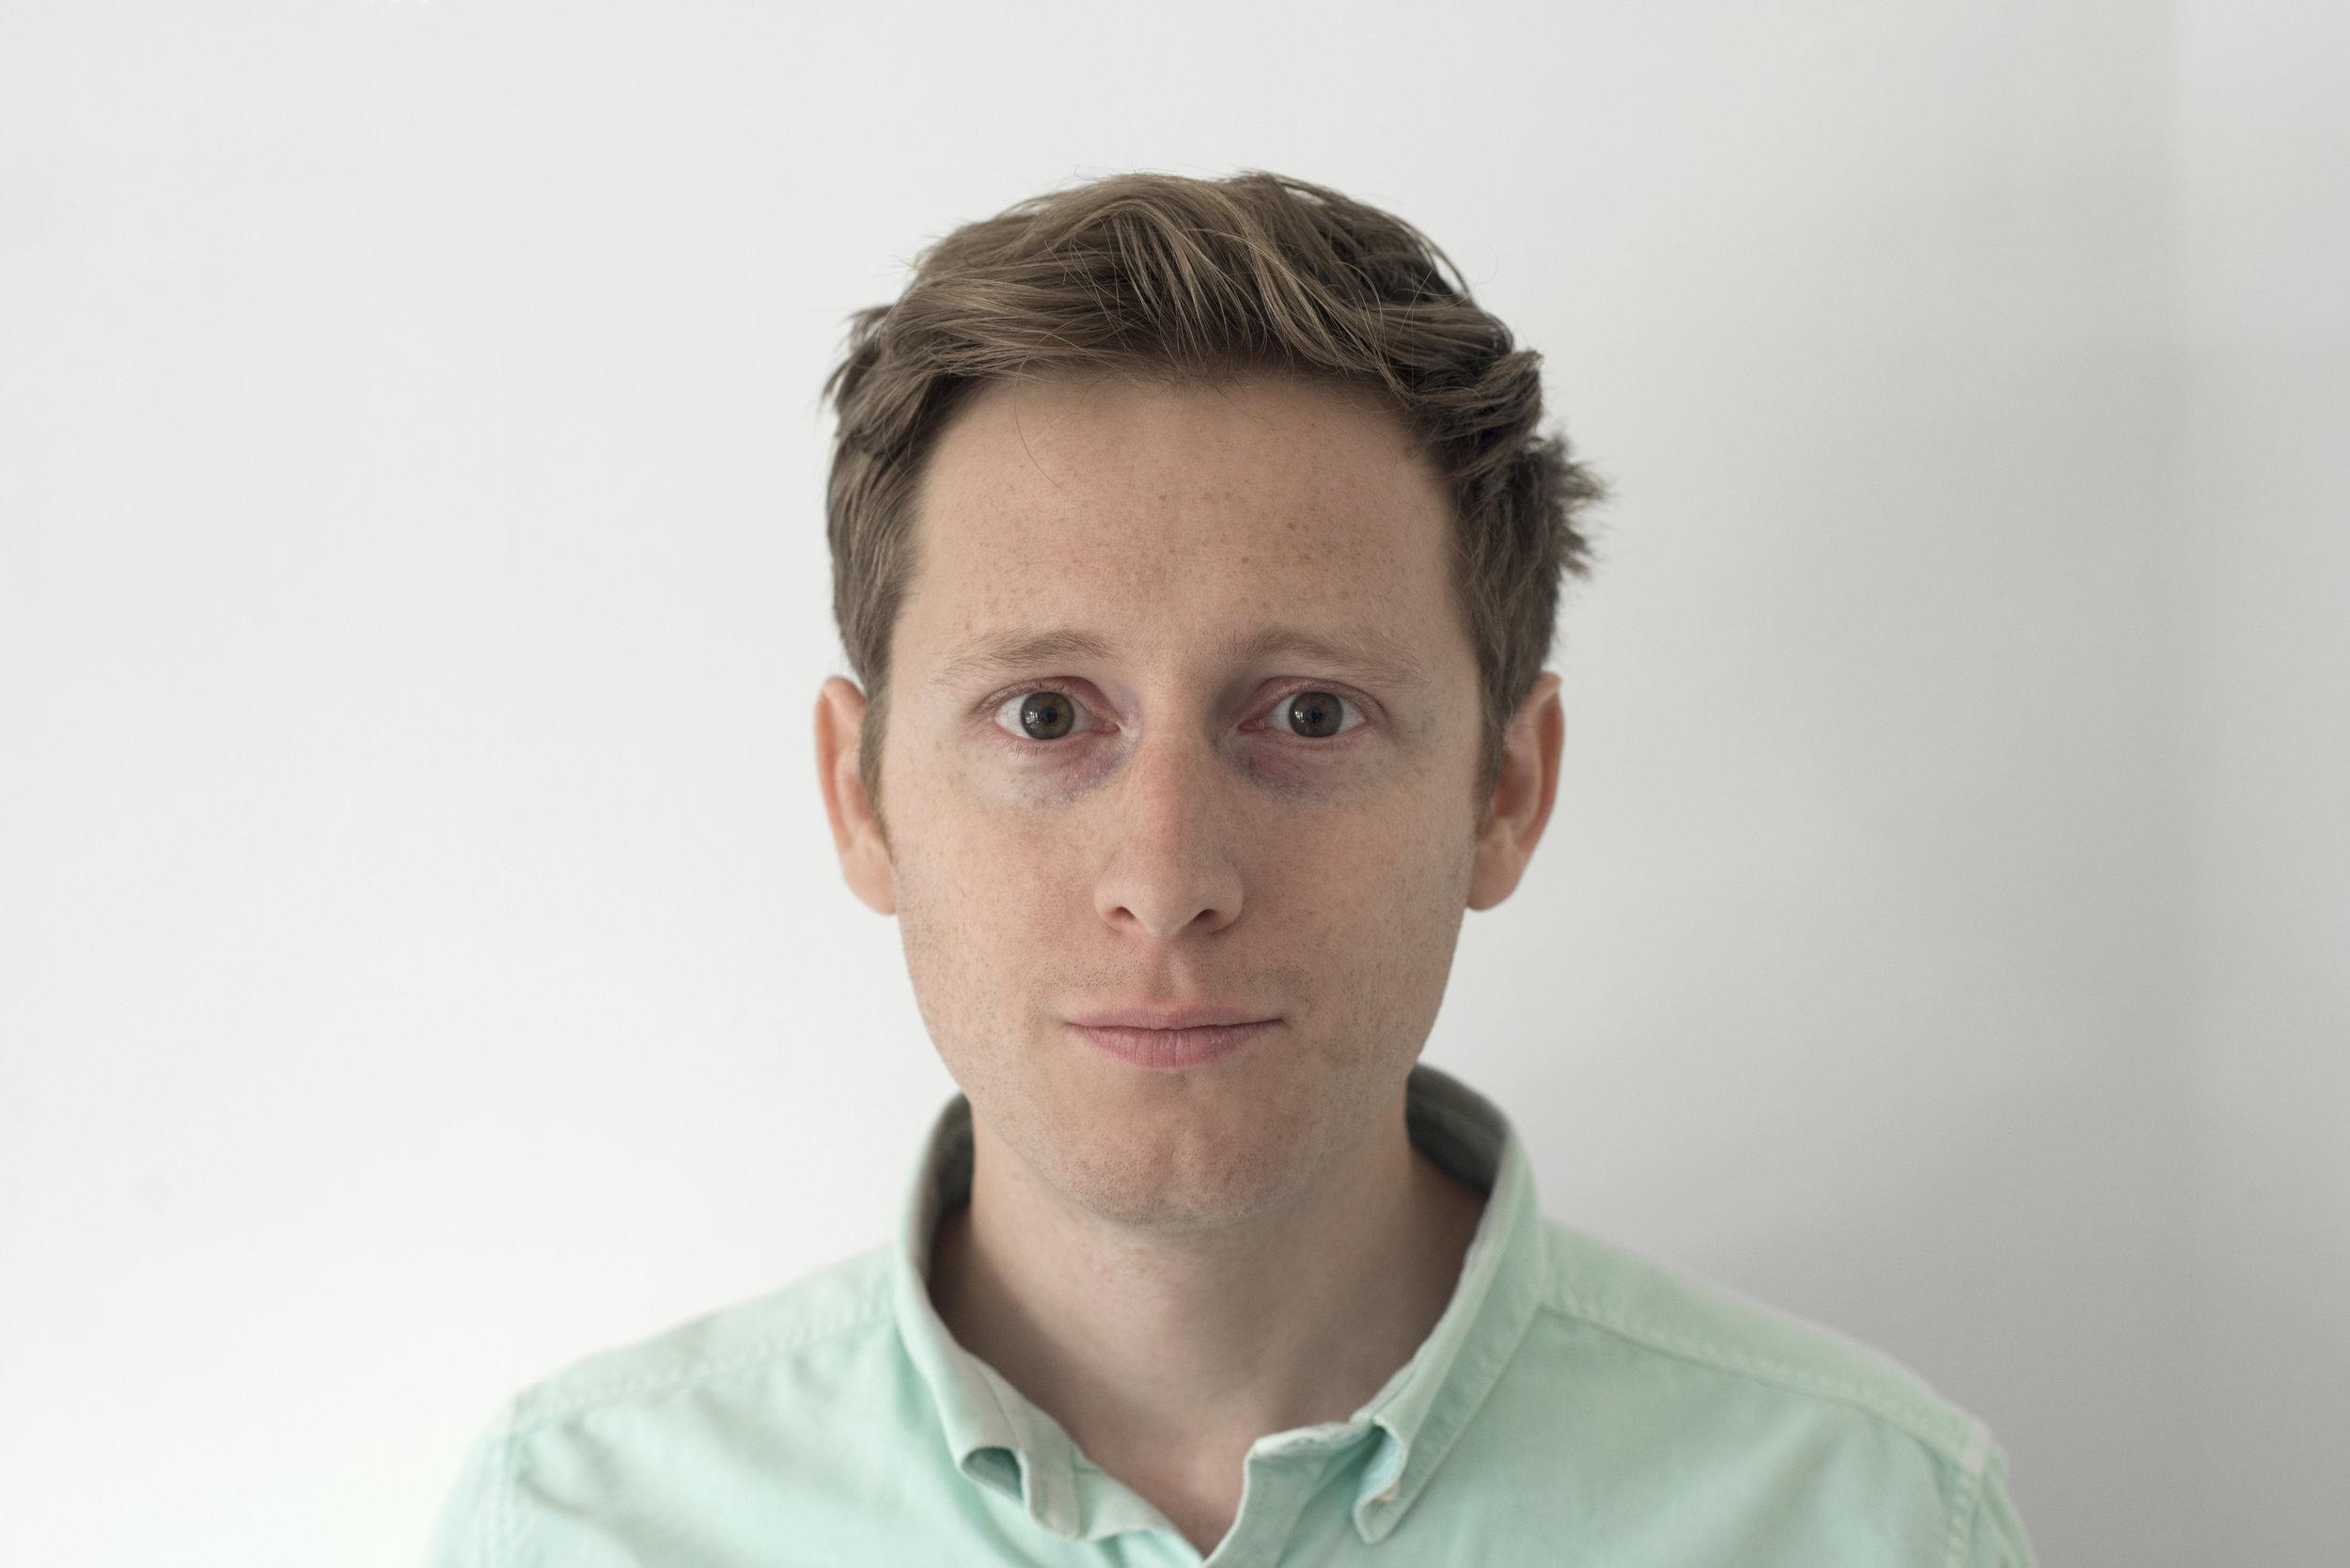 Matt-Dent-portrait